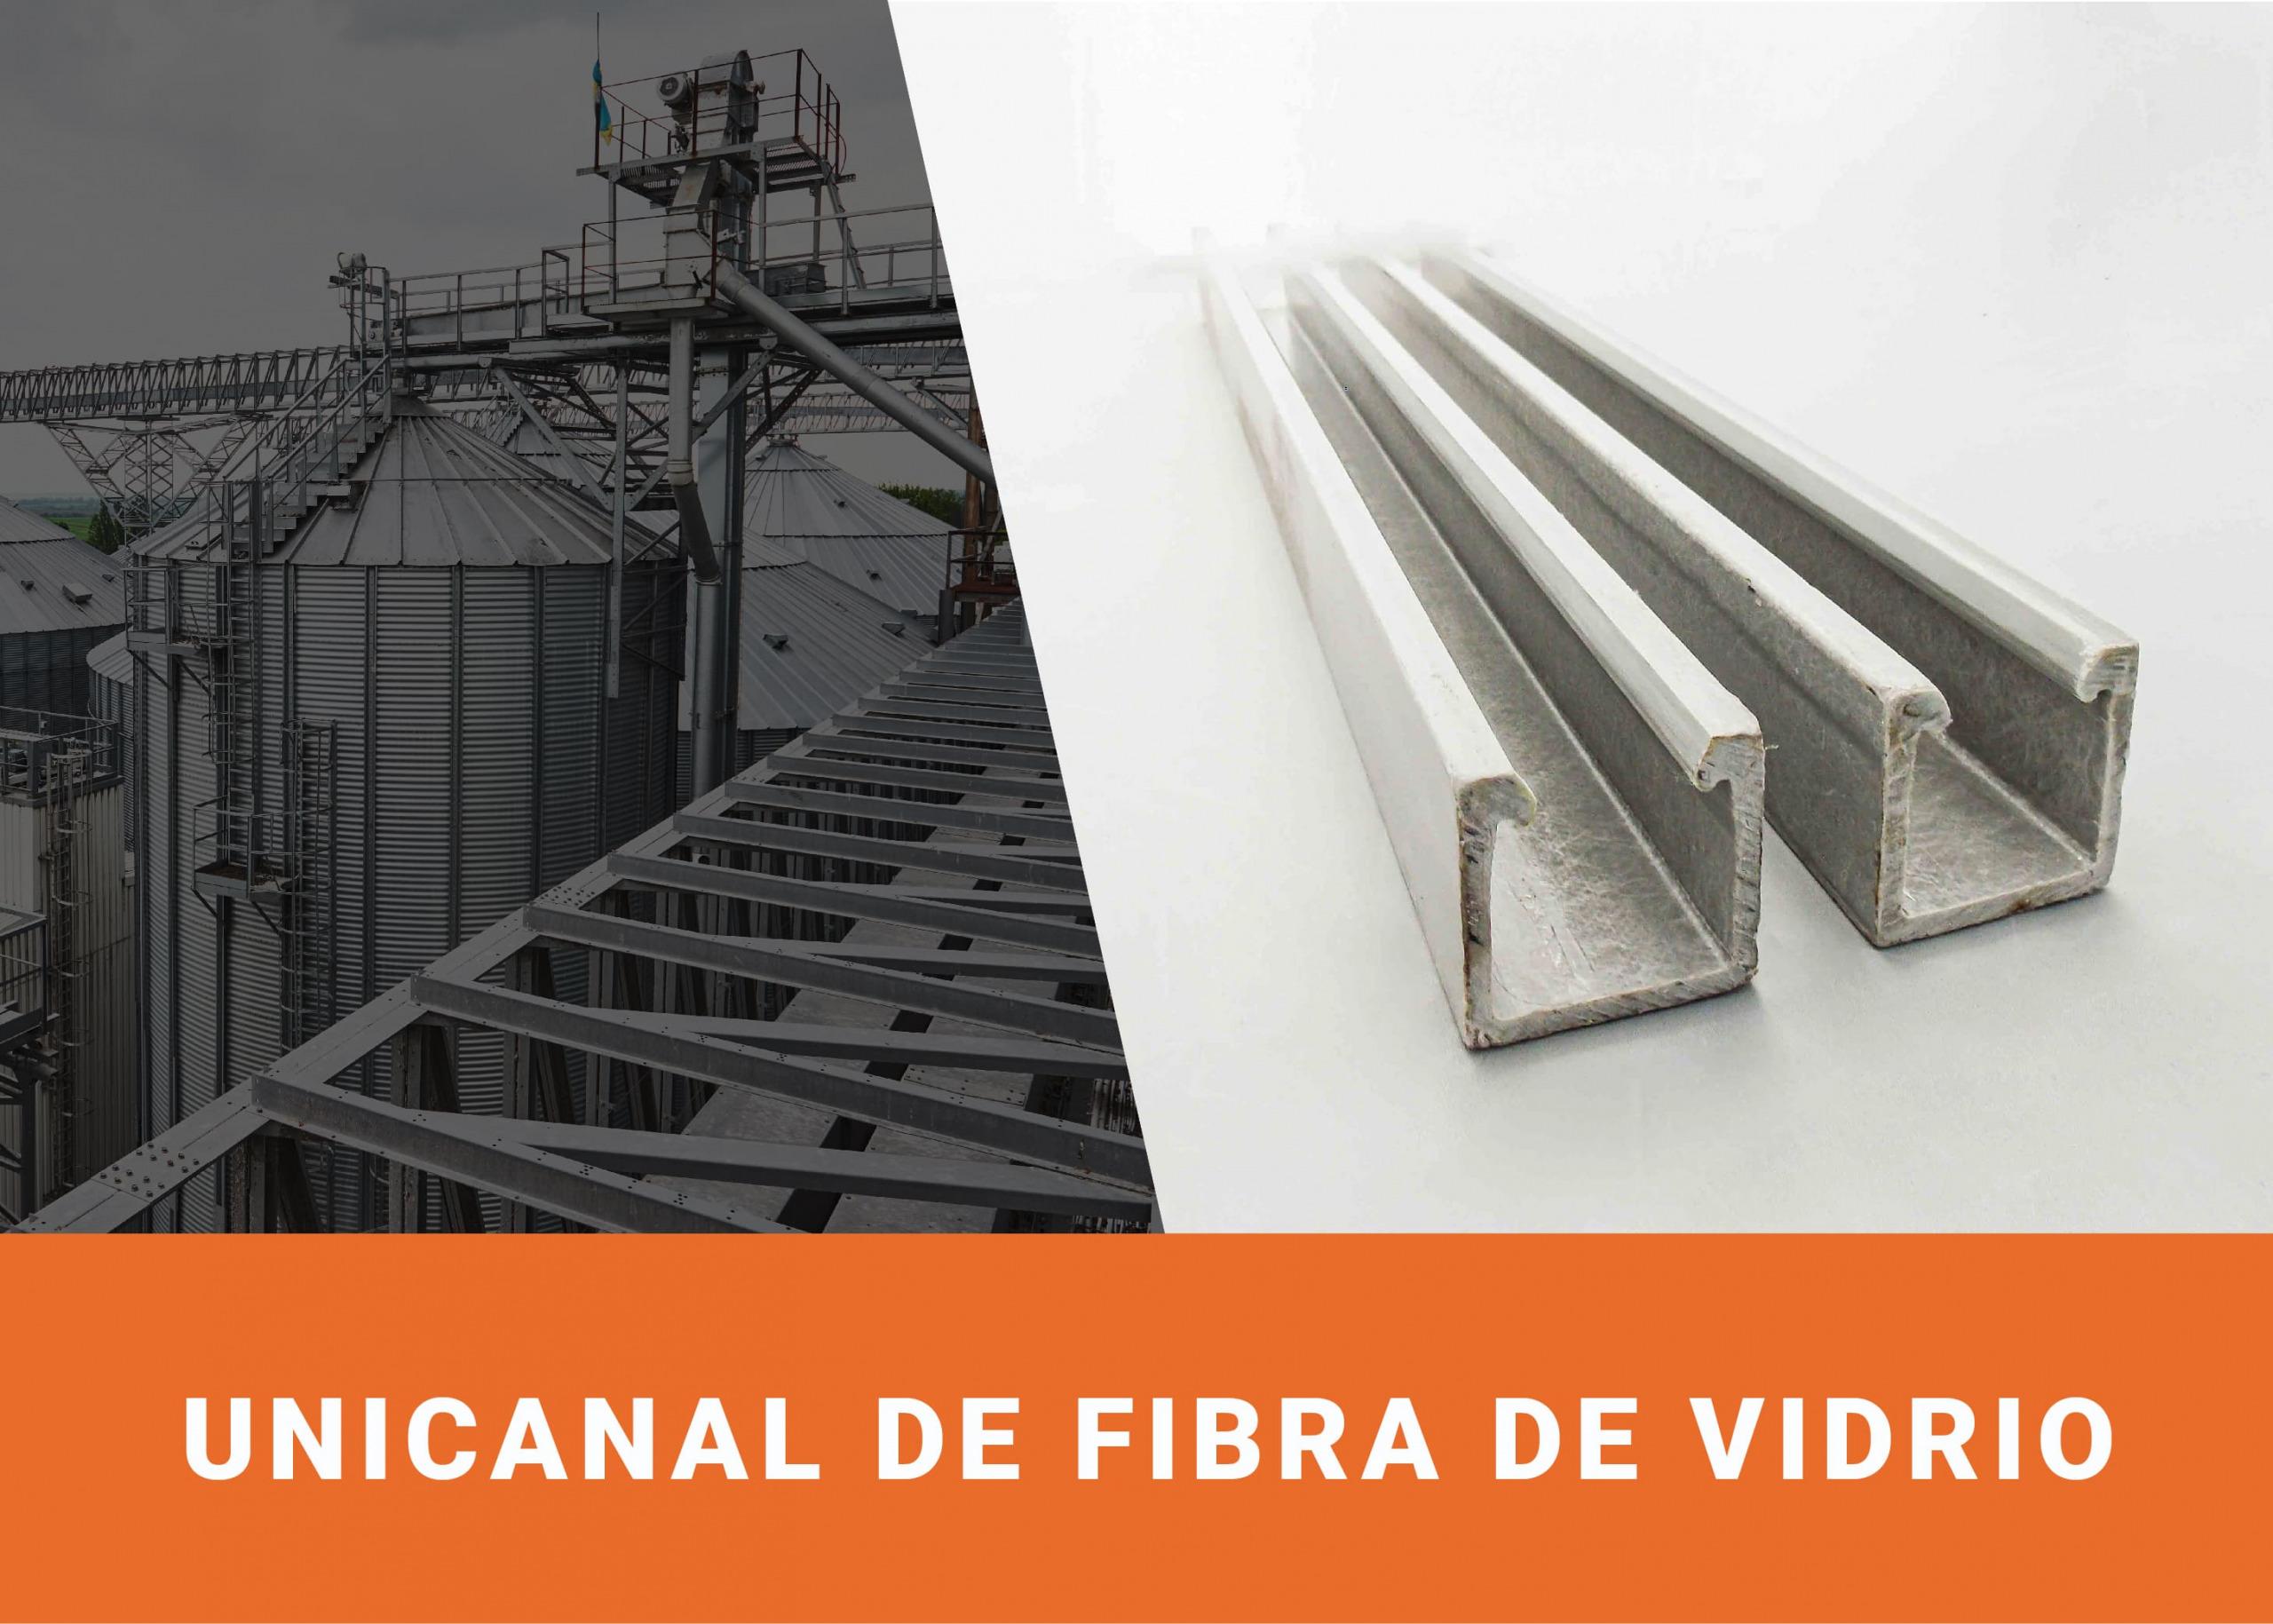 Unicanal de fibra de vidrio 4x4/4x2 Image